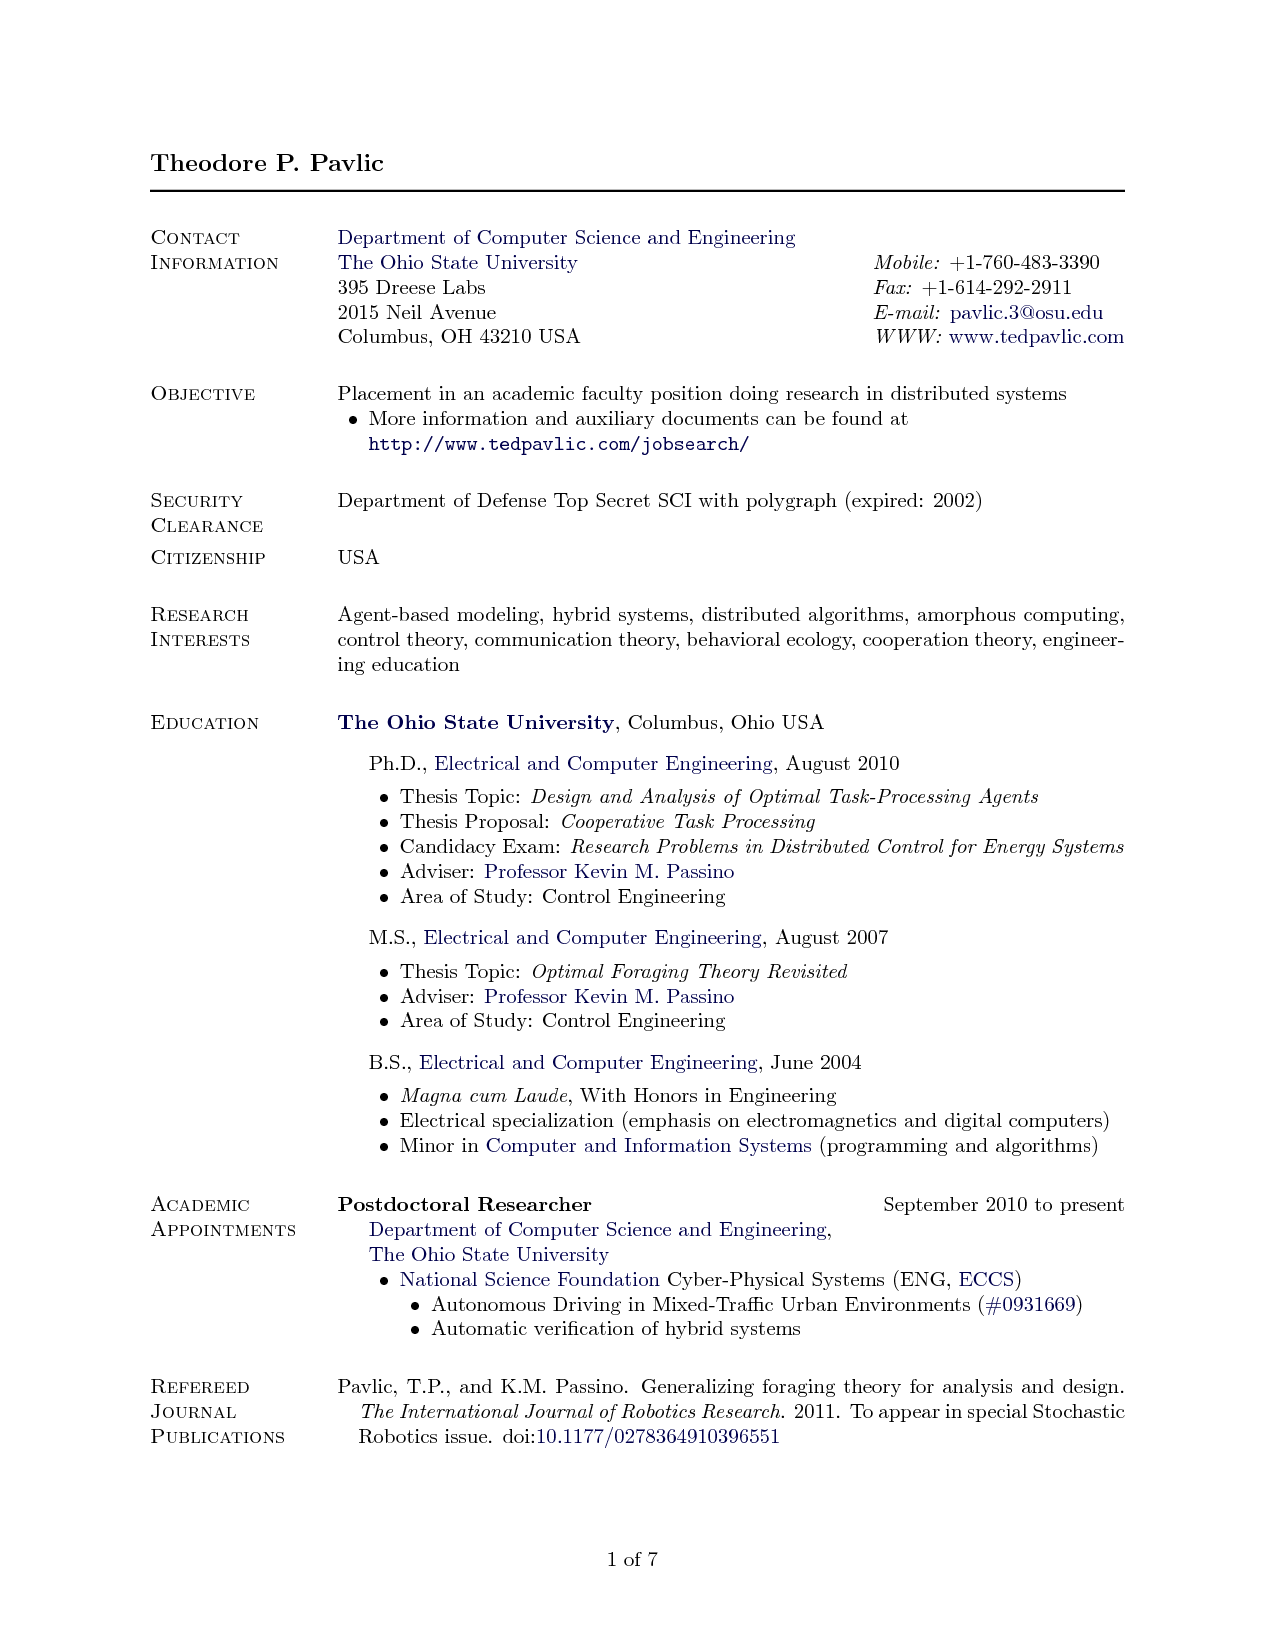 latex resume picture